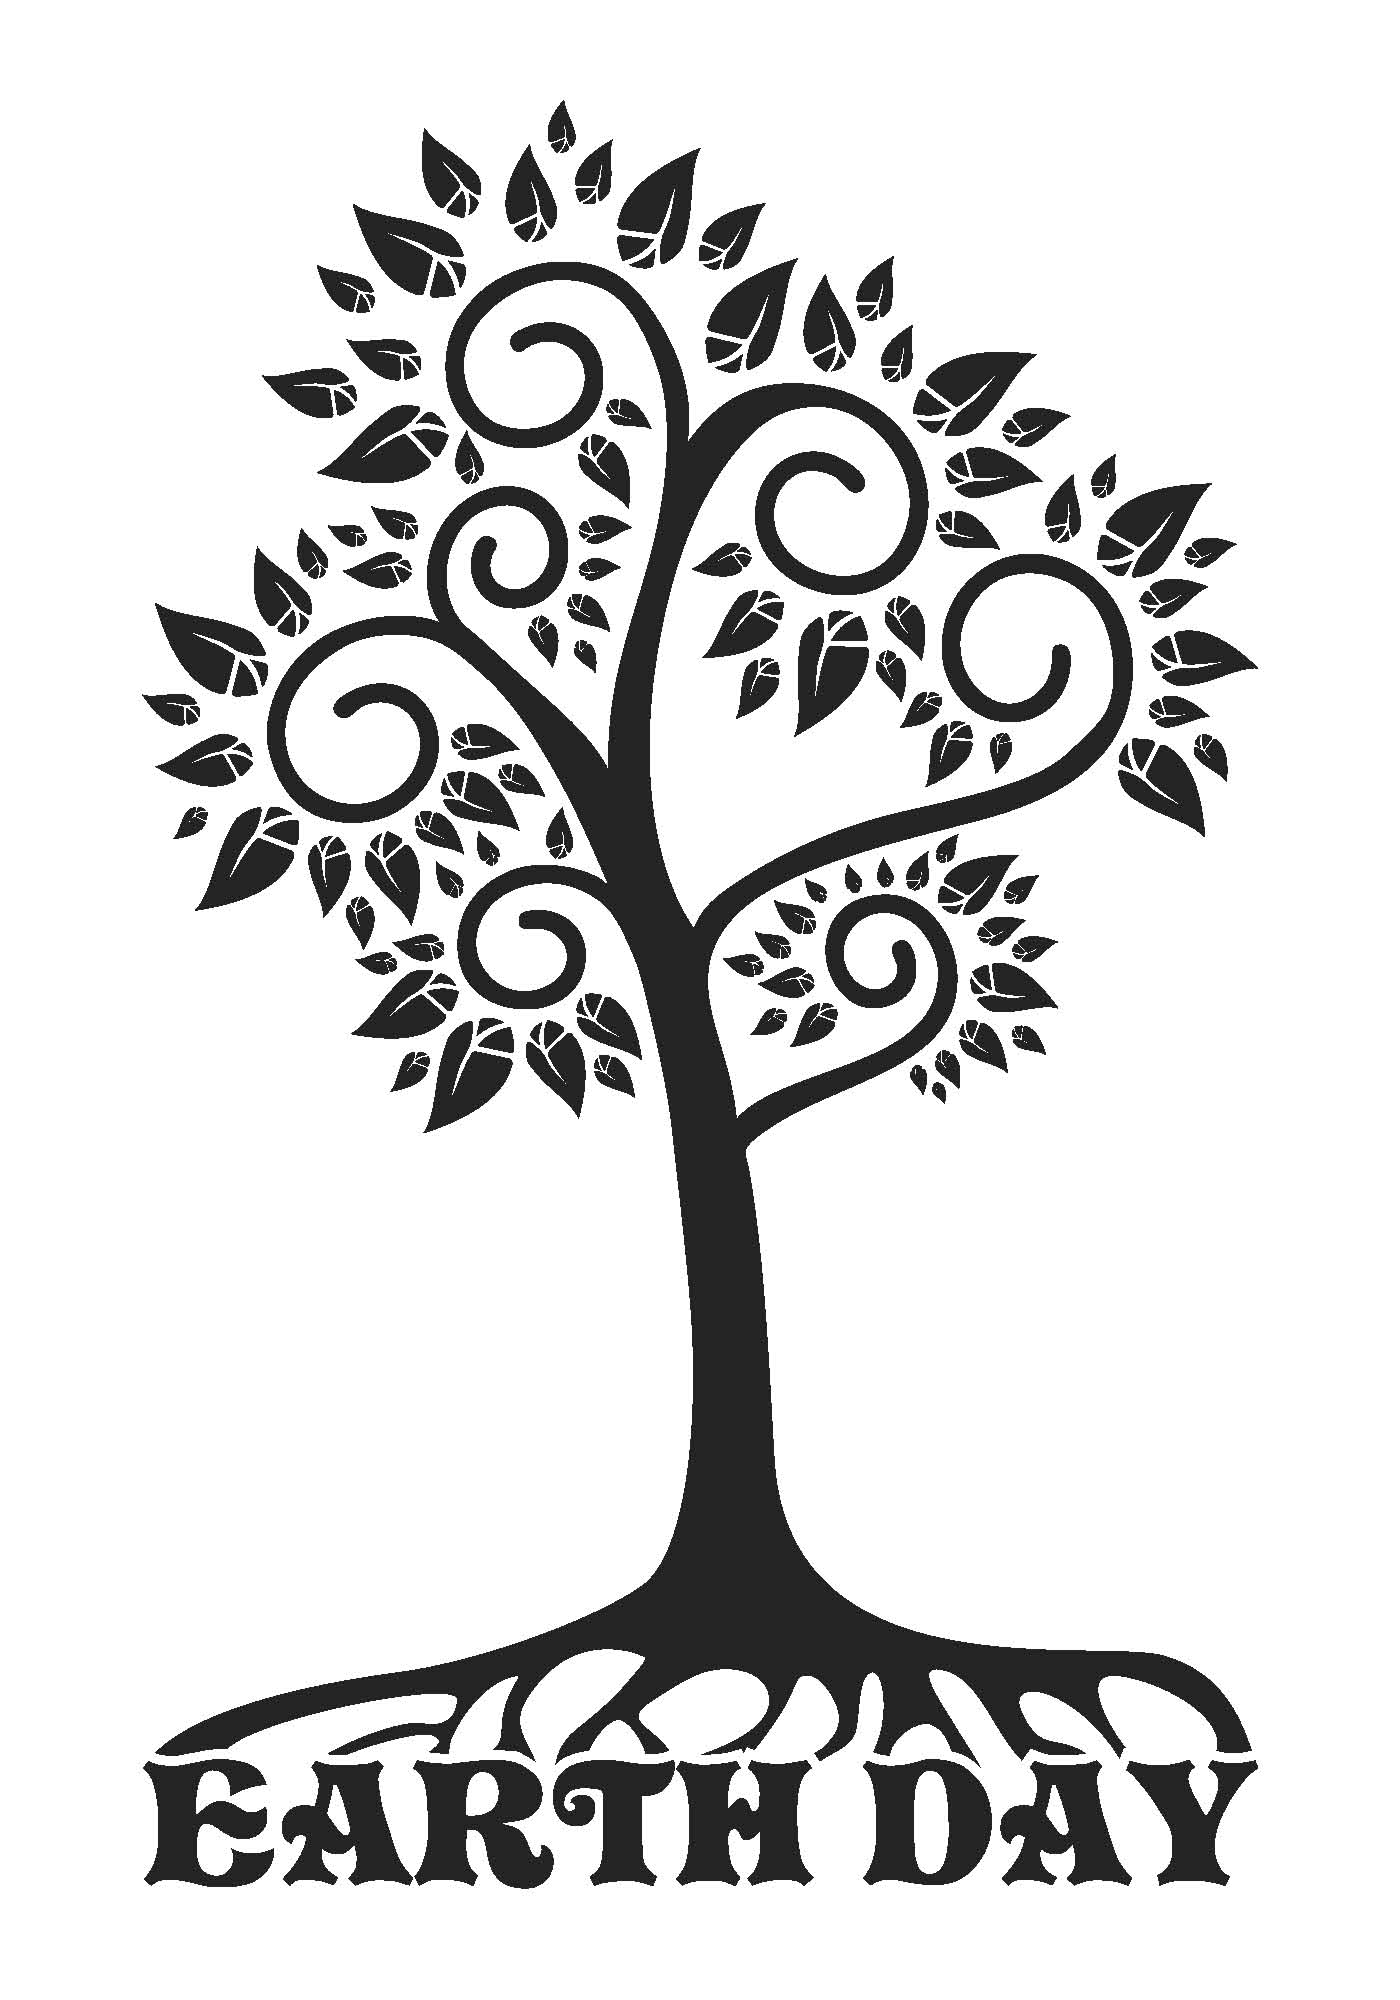 Earth Day Clip Art Black And White Clipartfest 4